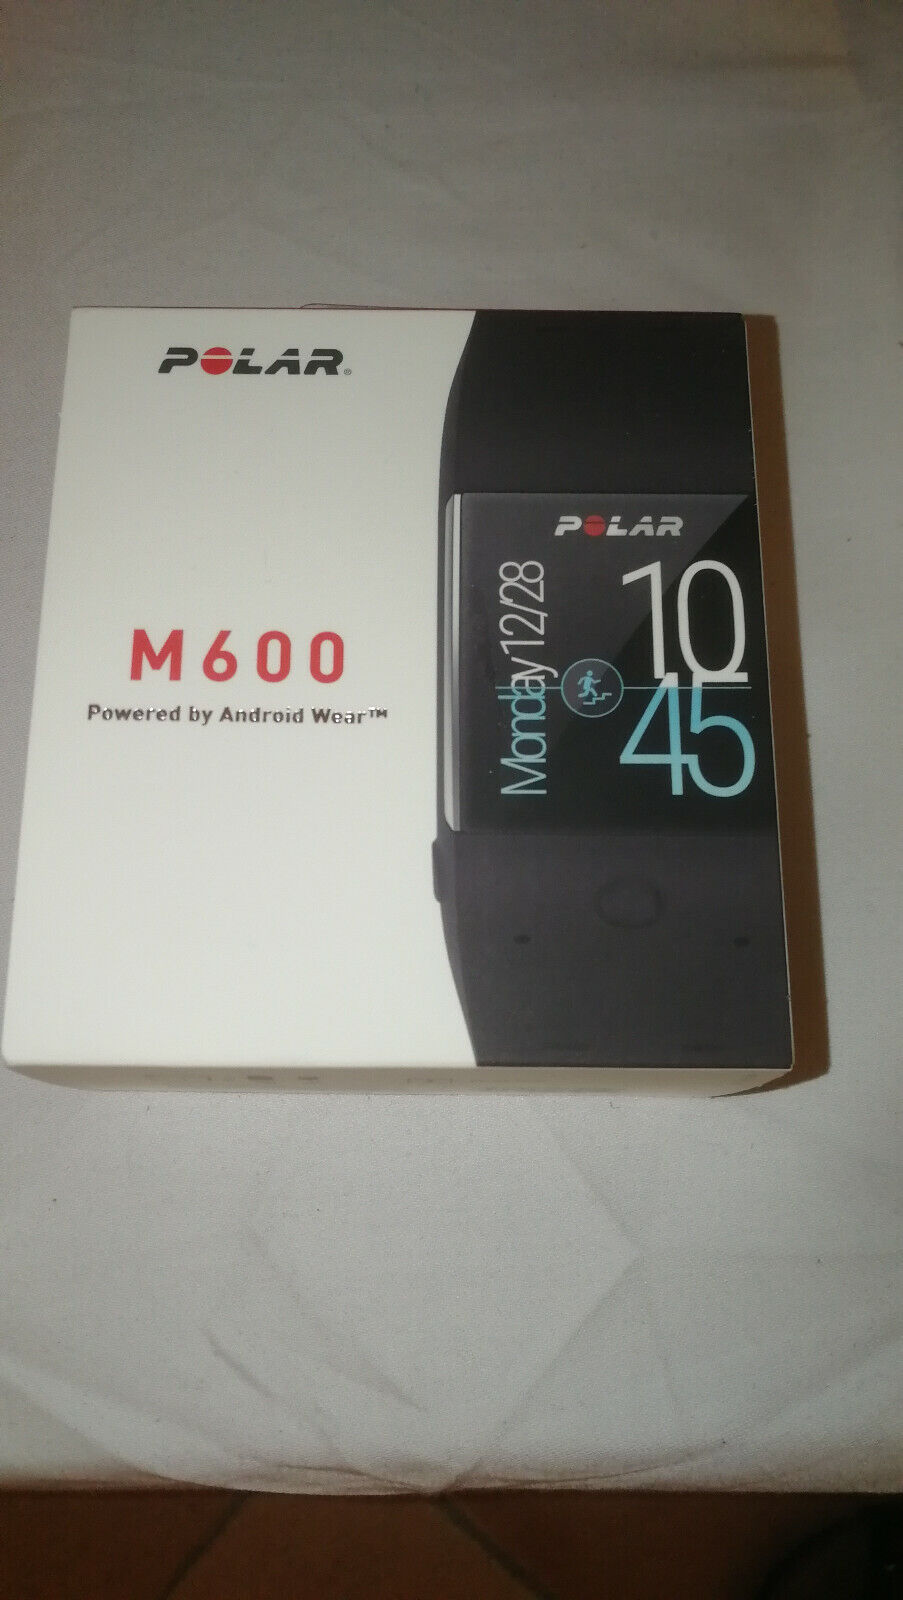 Polar M600 GPS Sportuhr SmartWatch Android Wear schwarz